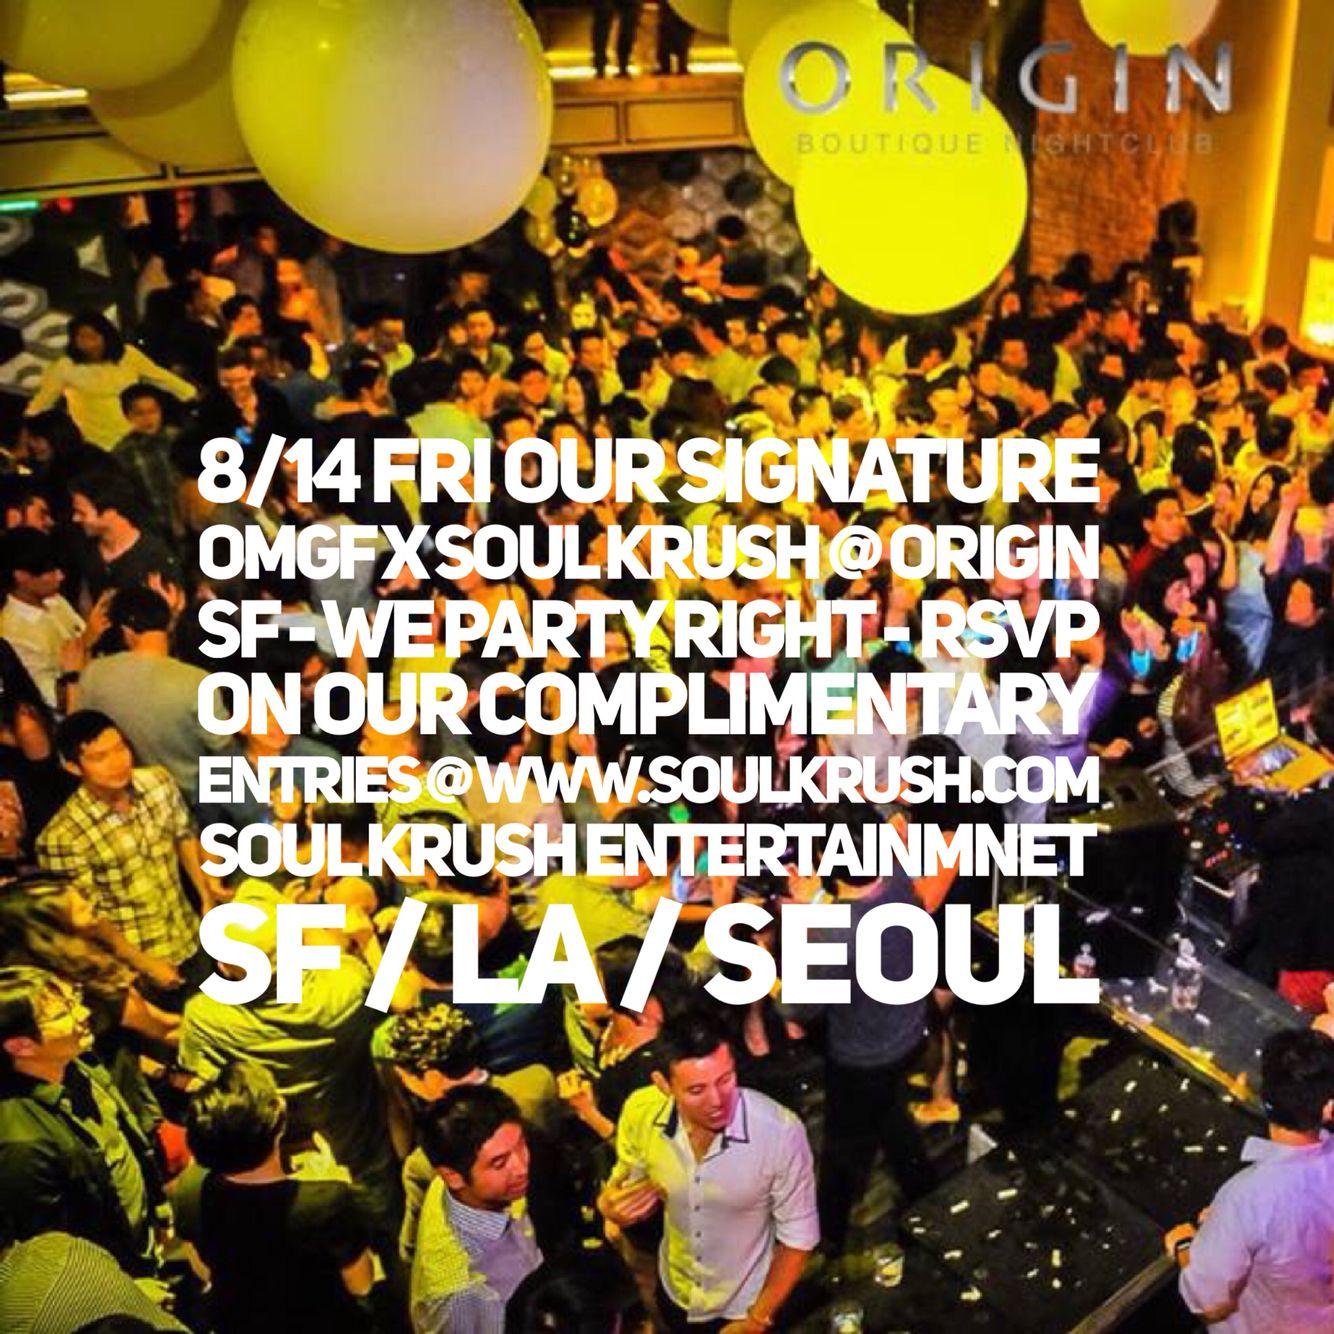 Our Signature Night! 8/14 Friday Gathering @ #OMGFridays @ #OriginSF x Soul Krush(소크) - Complimentary Entry B4 1030 RSVP @ http://eepurl.com/Ku71b  or www.soulkrush.com / VIP/Table 테이블 예약 408-529-1804  #Friday #OriginSF #OMGFridays #SF #Party #Nightlife #SoulKrush #SanFrancisco #Night #EDM #파티 #일랙 #클럽 #샌프란 #한인 #소크 #힙합 #유학생